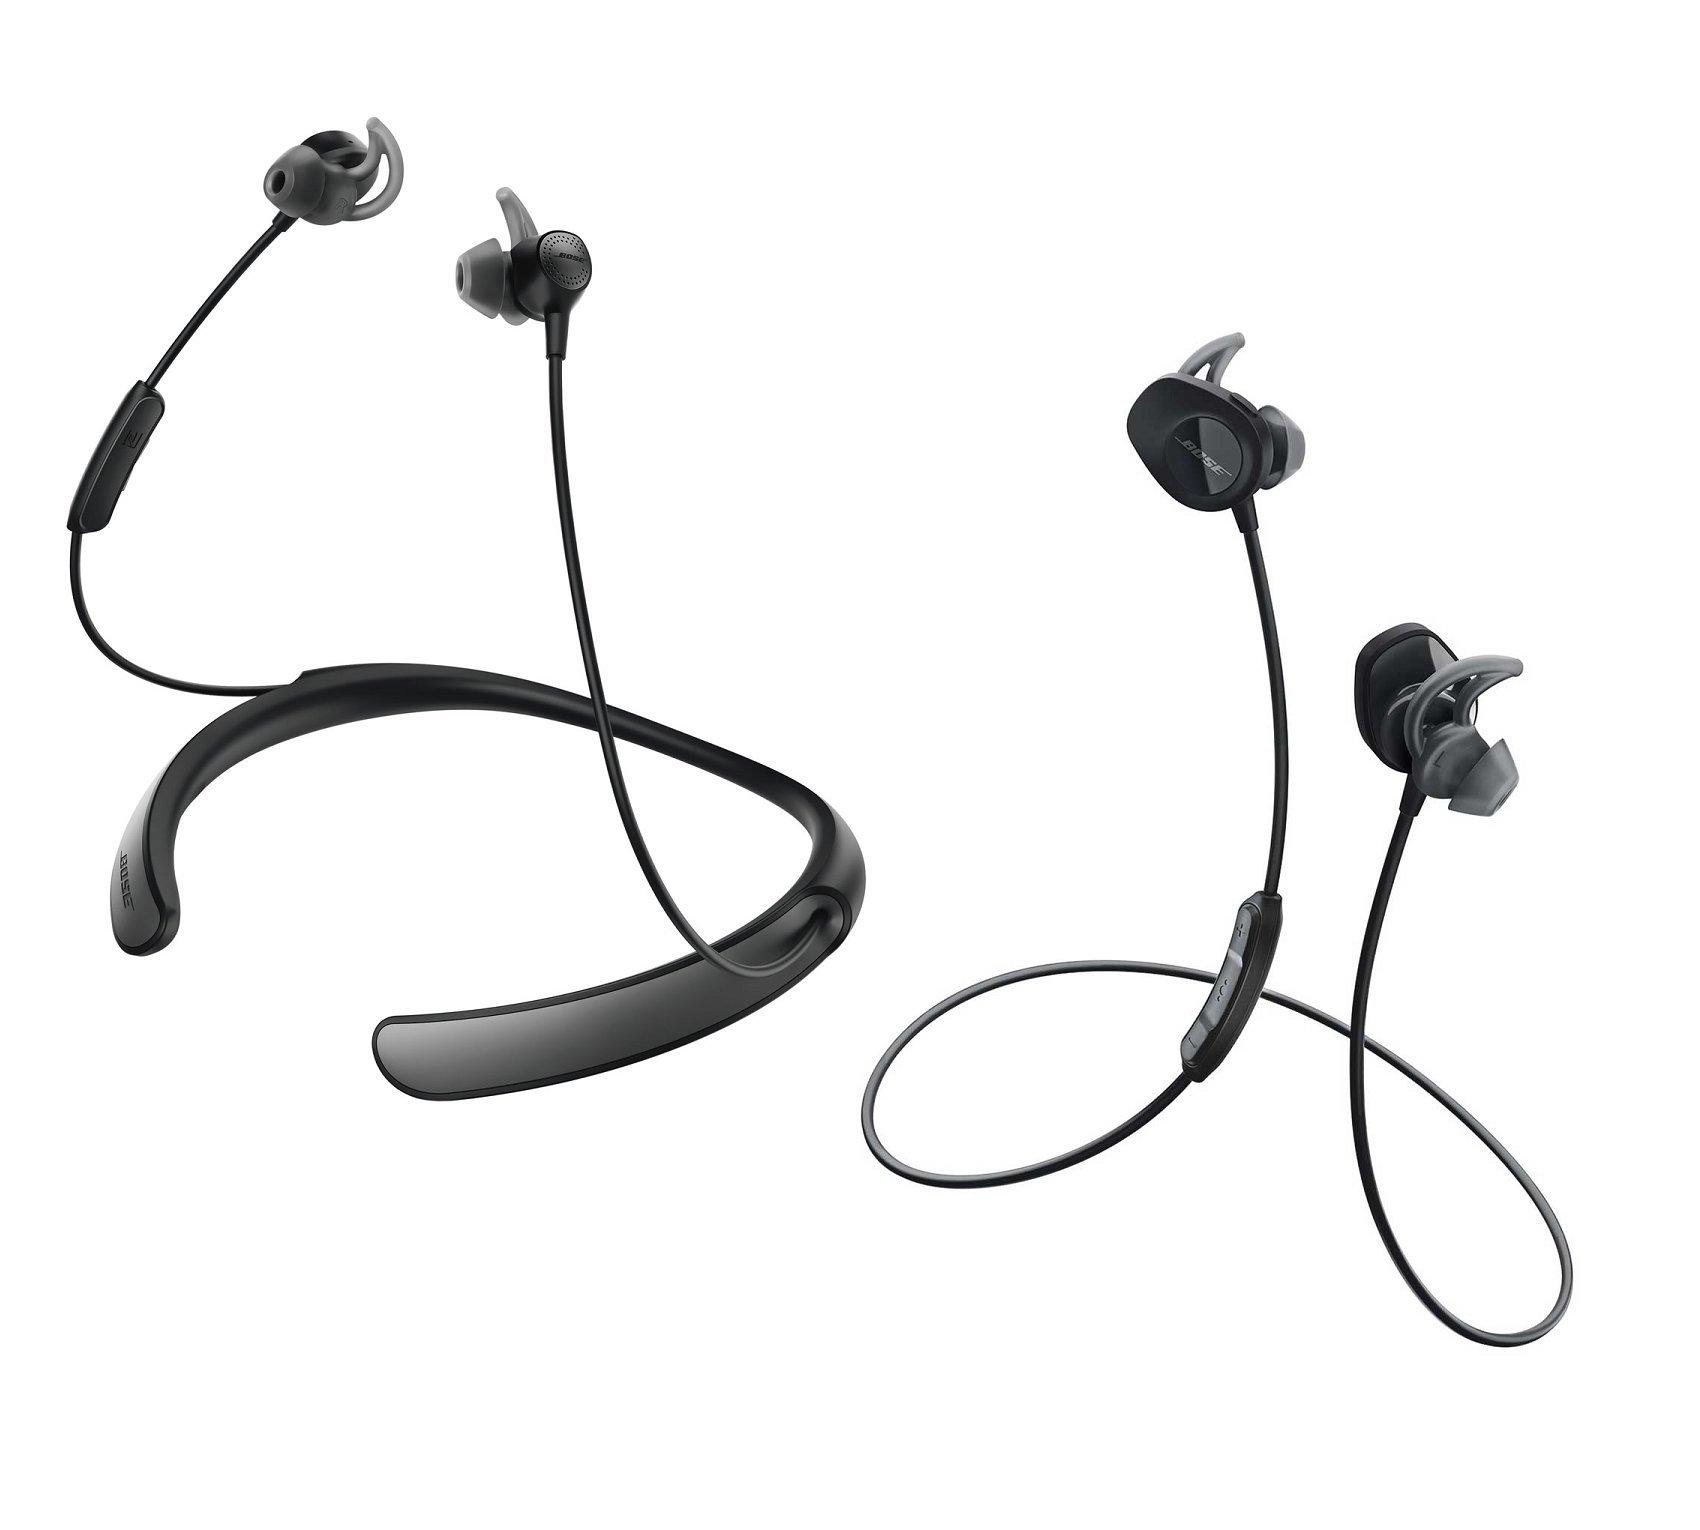 Bose Bluetooth Headphone Bundle - SoundSport Wireless Black & QuietControl 30 Black In-ear Headphones